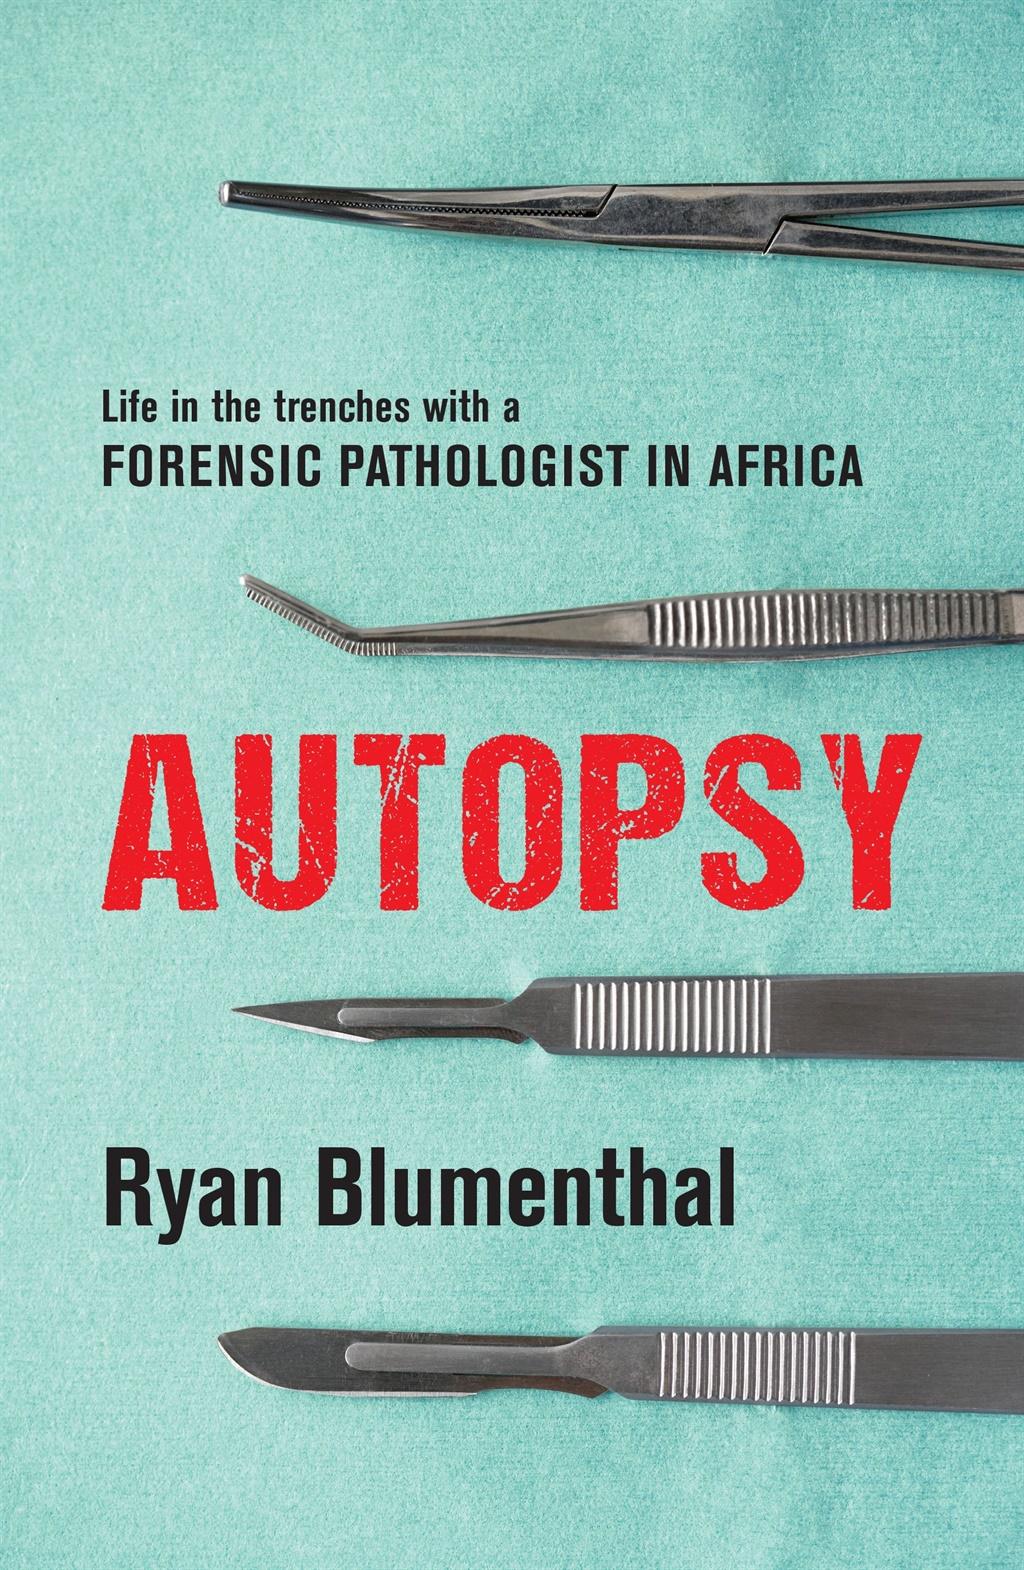 Autopsy by Ryan Blumenthal.